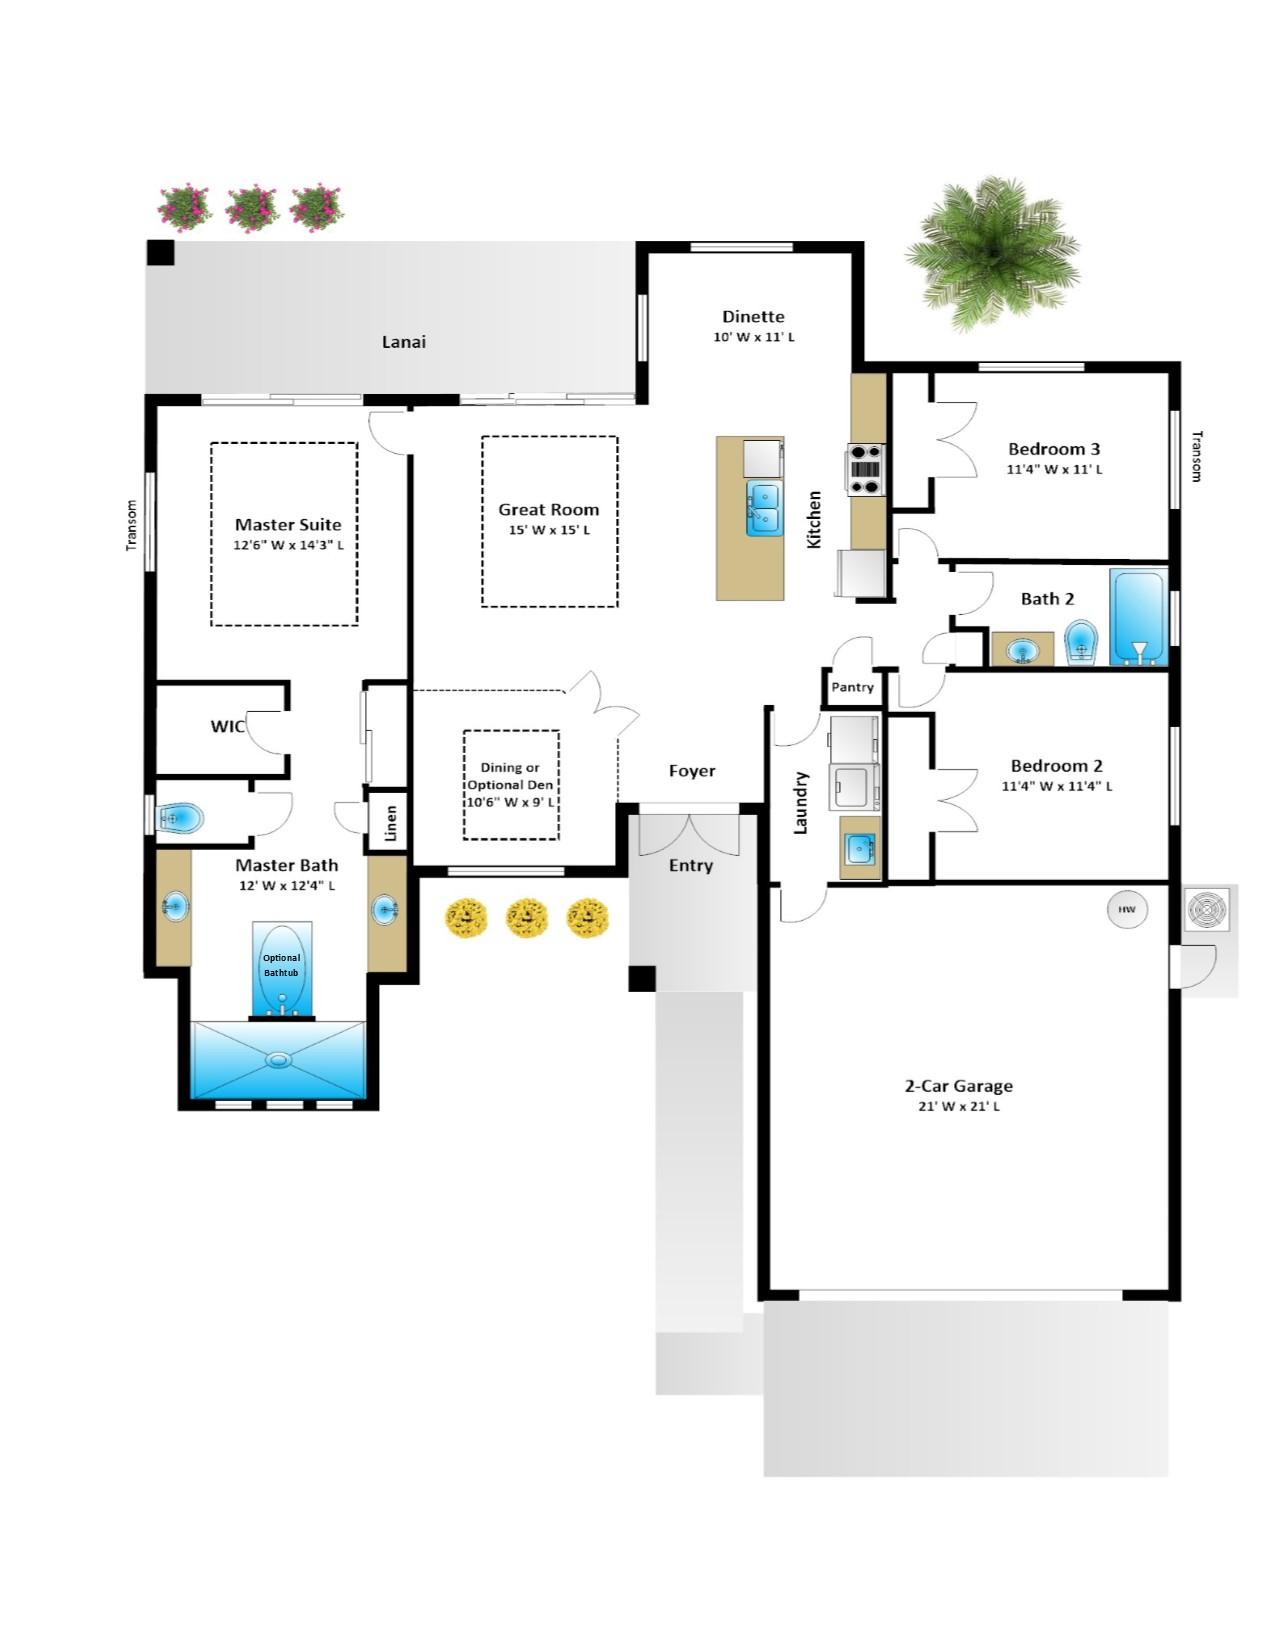 Kismet – 3 Bedroom 2 Bath 2 Car Garage